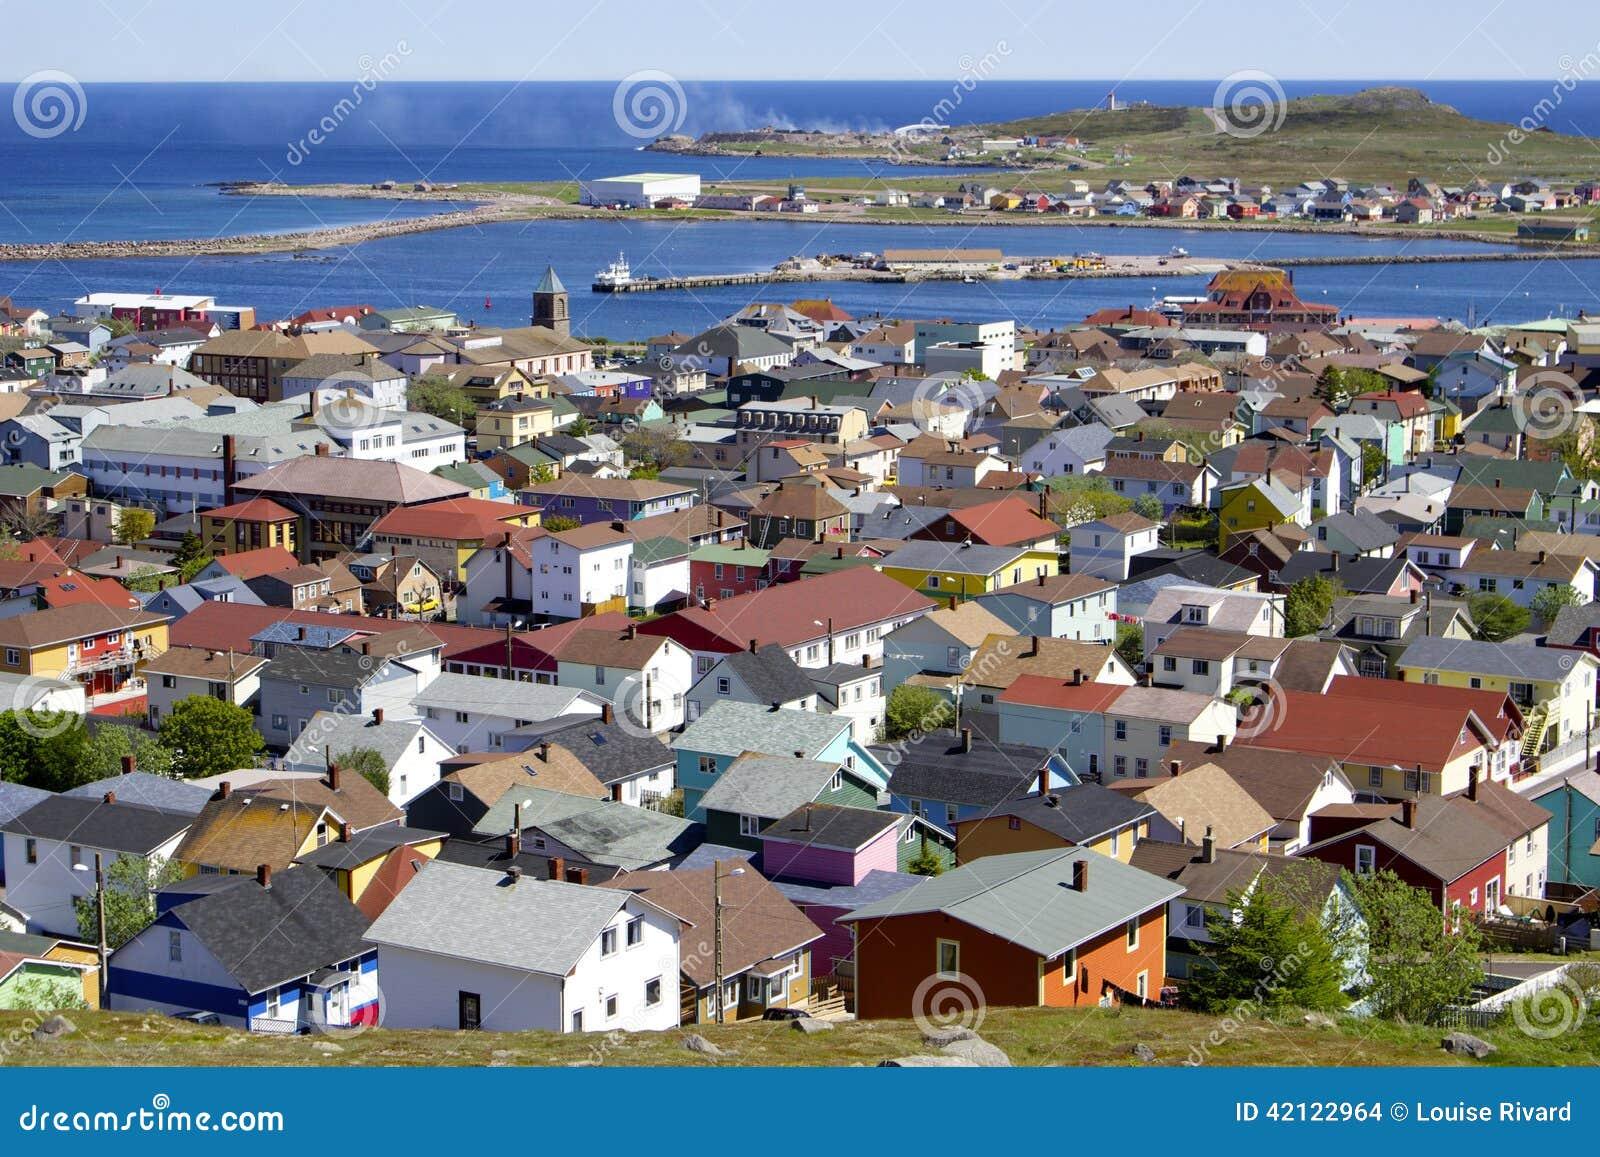 Saint- Pierre Island Houses Stock Photo - Image: 42122964